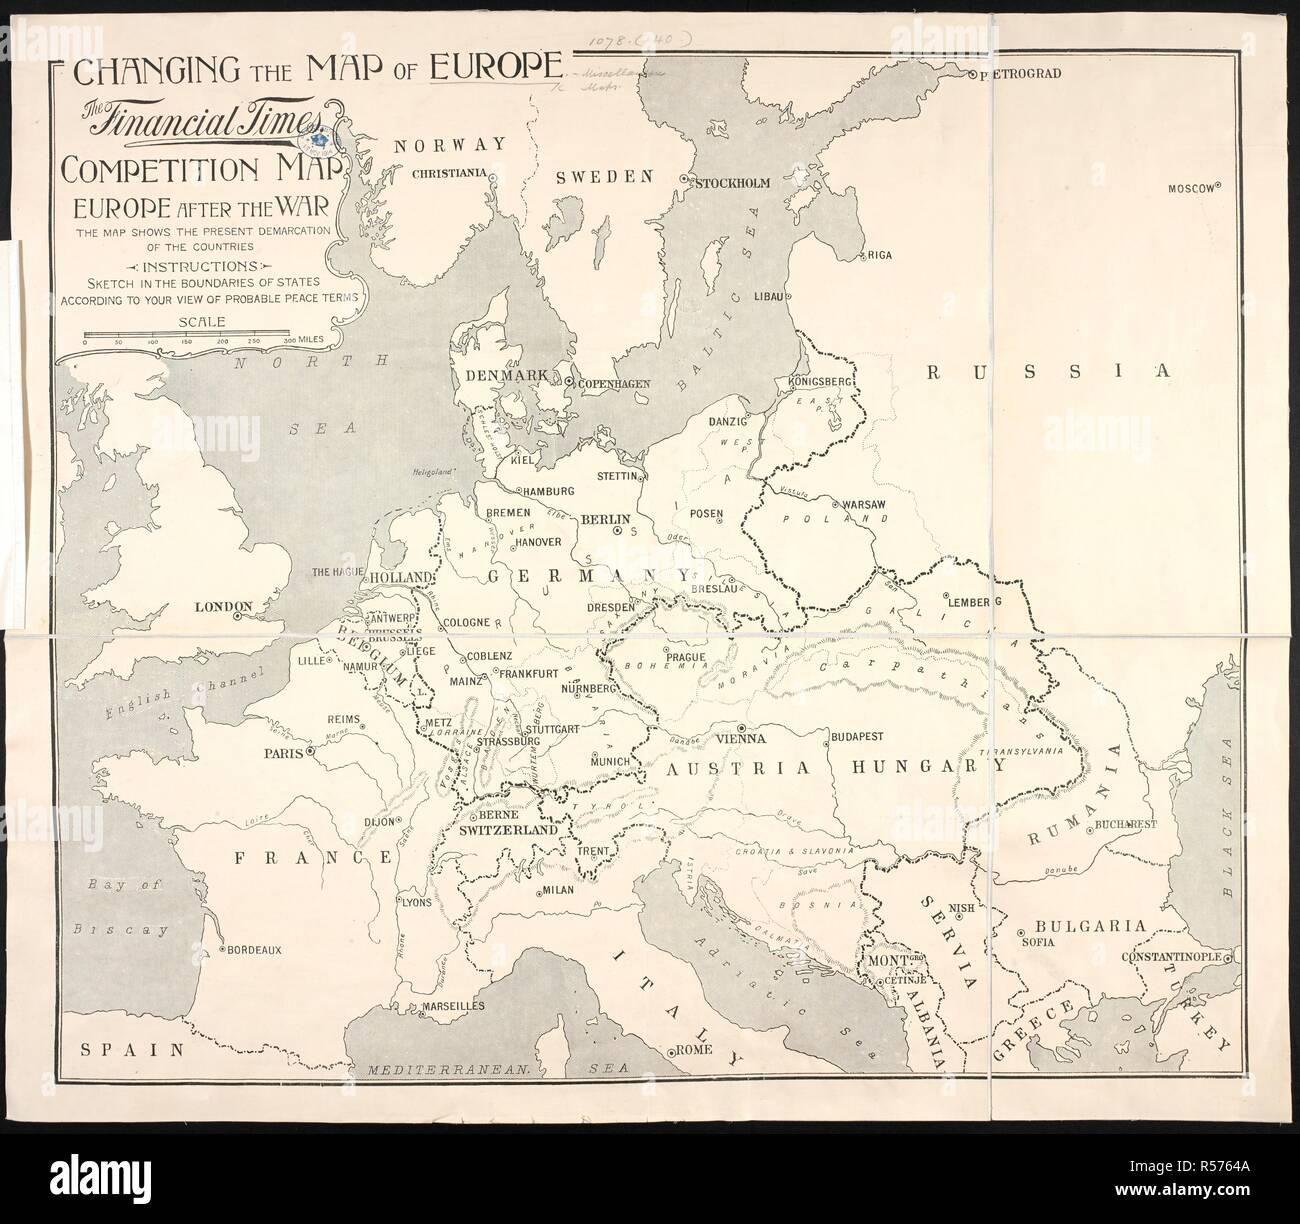 Carte De Leurope Apres La Premiere Guerre Mondiale.Un Plan De La Premiere Guerre Mondiale La Modification De